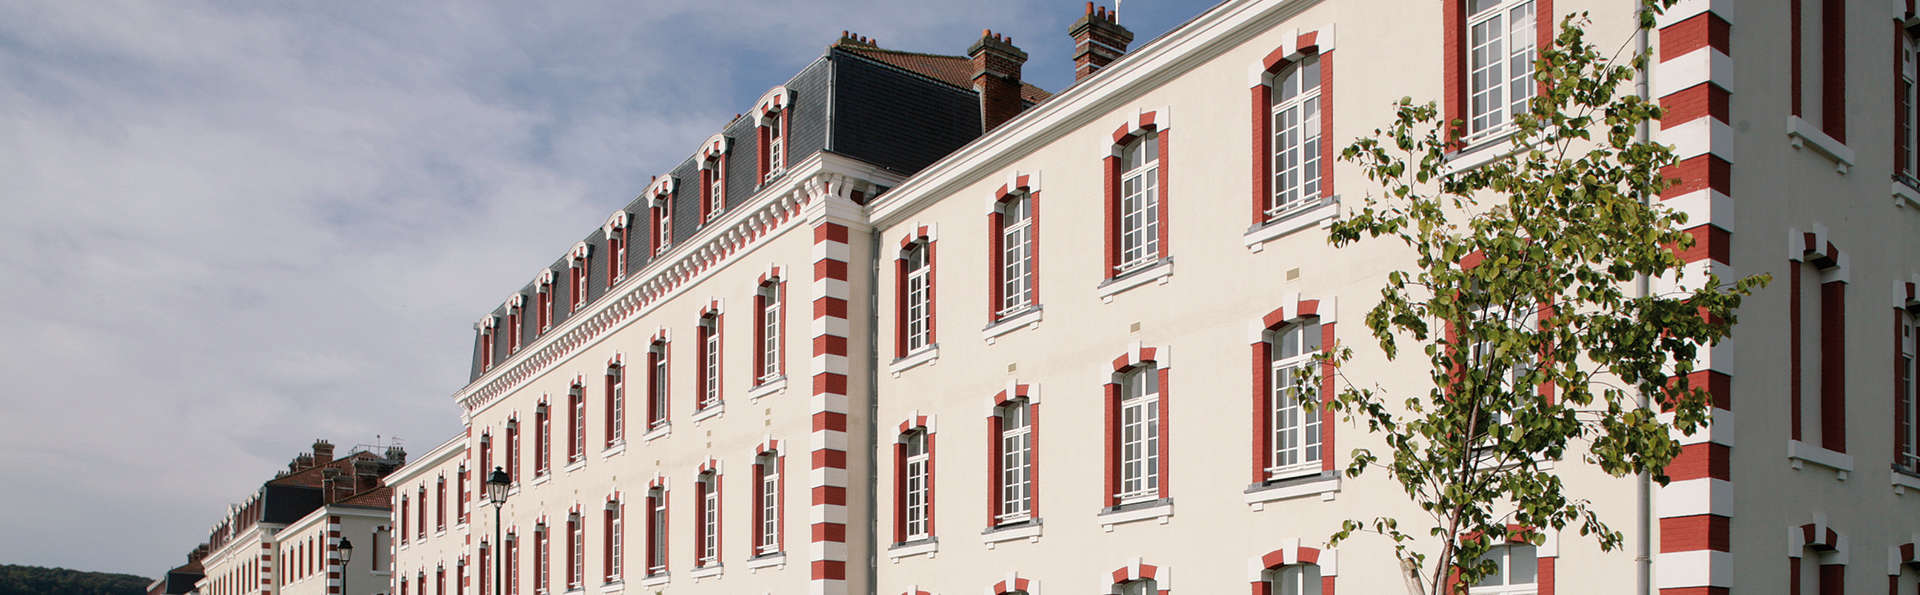 Entorno de relax cerca de Reims